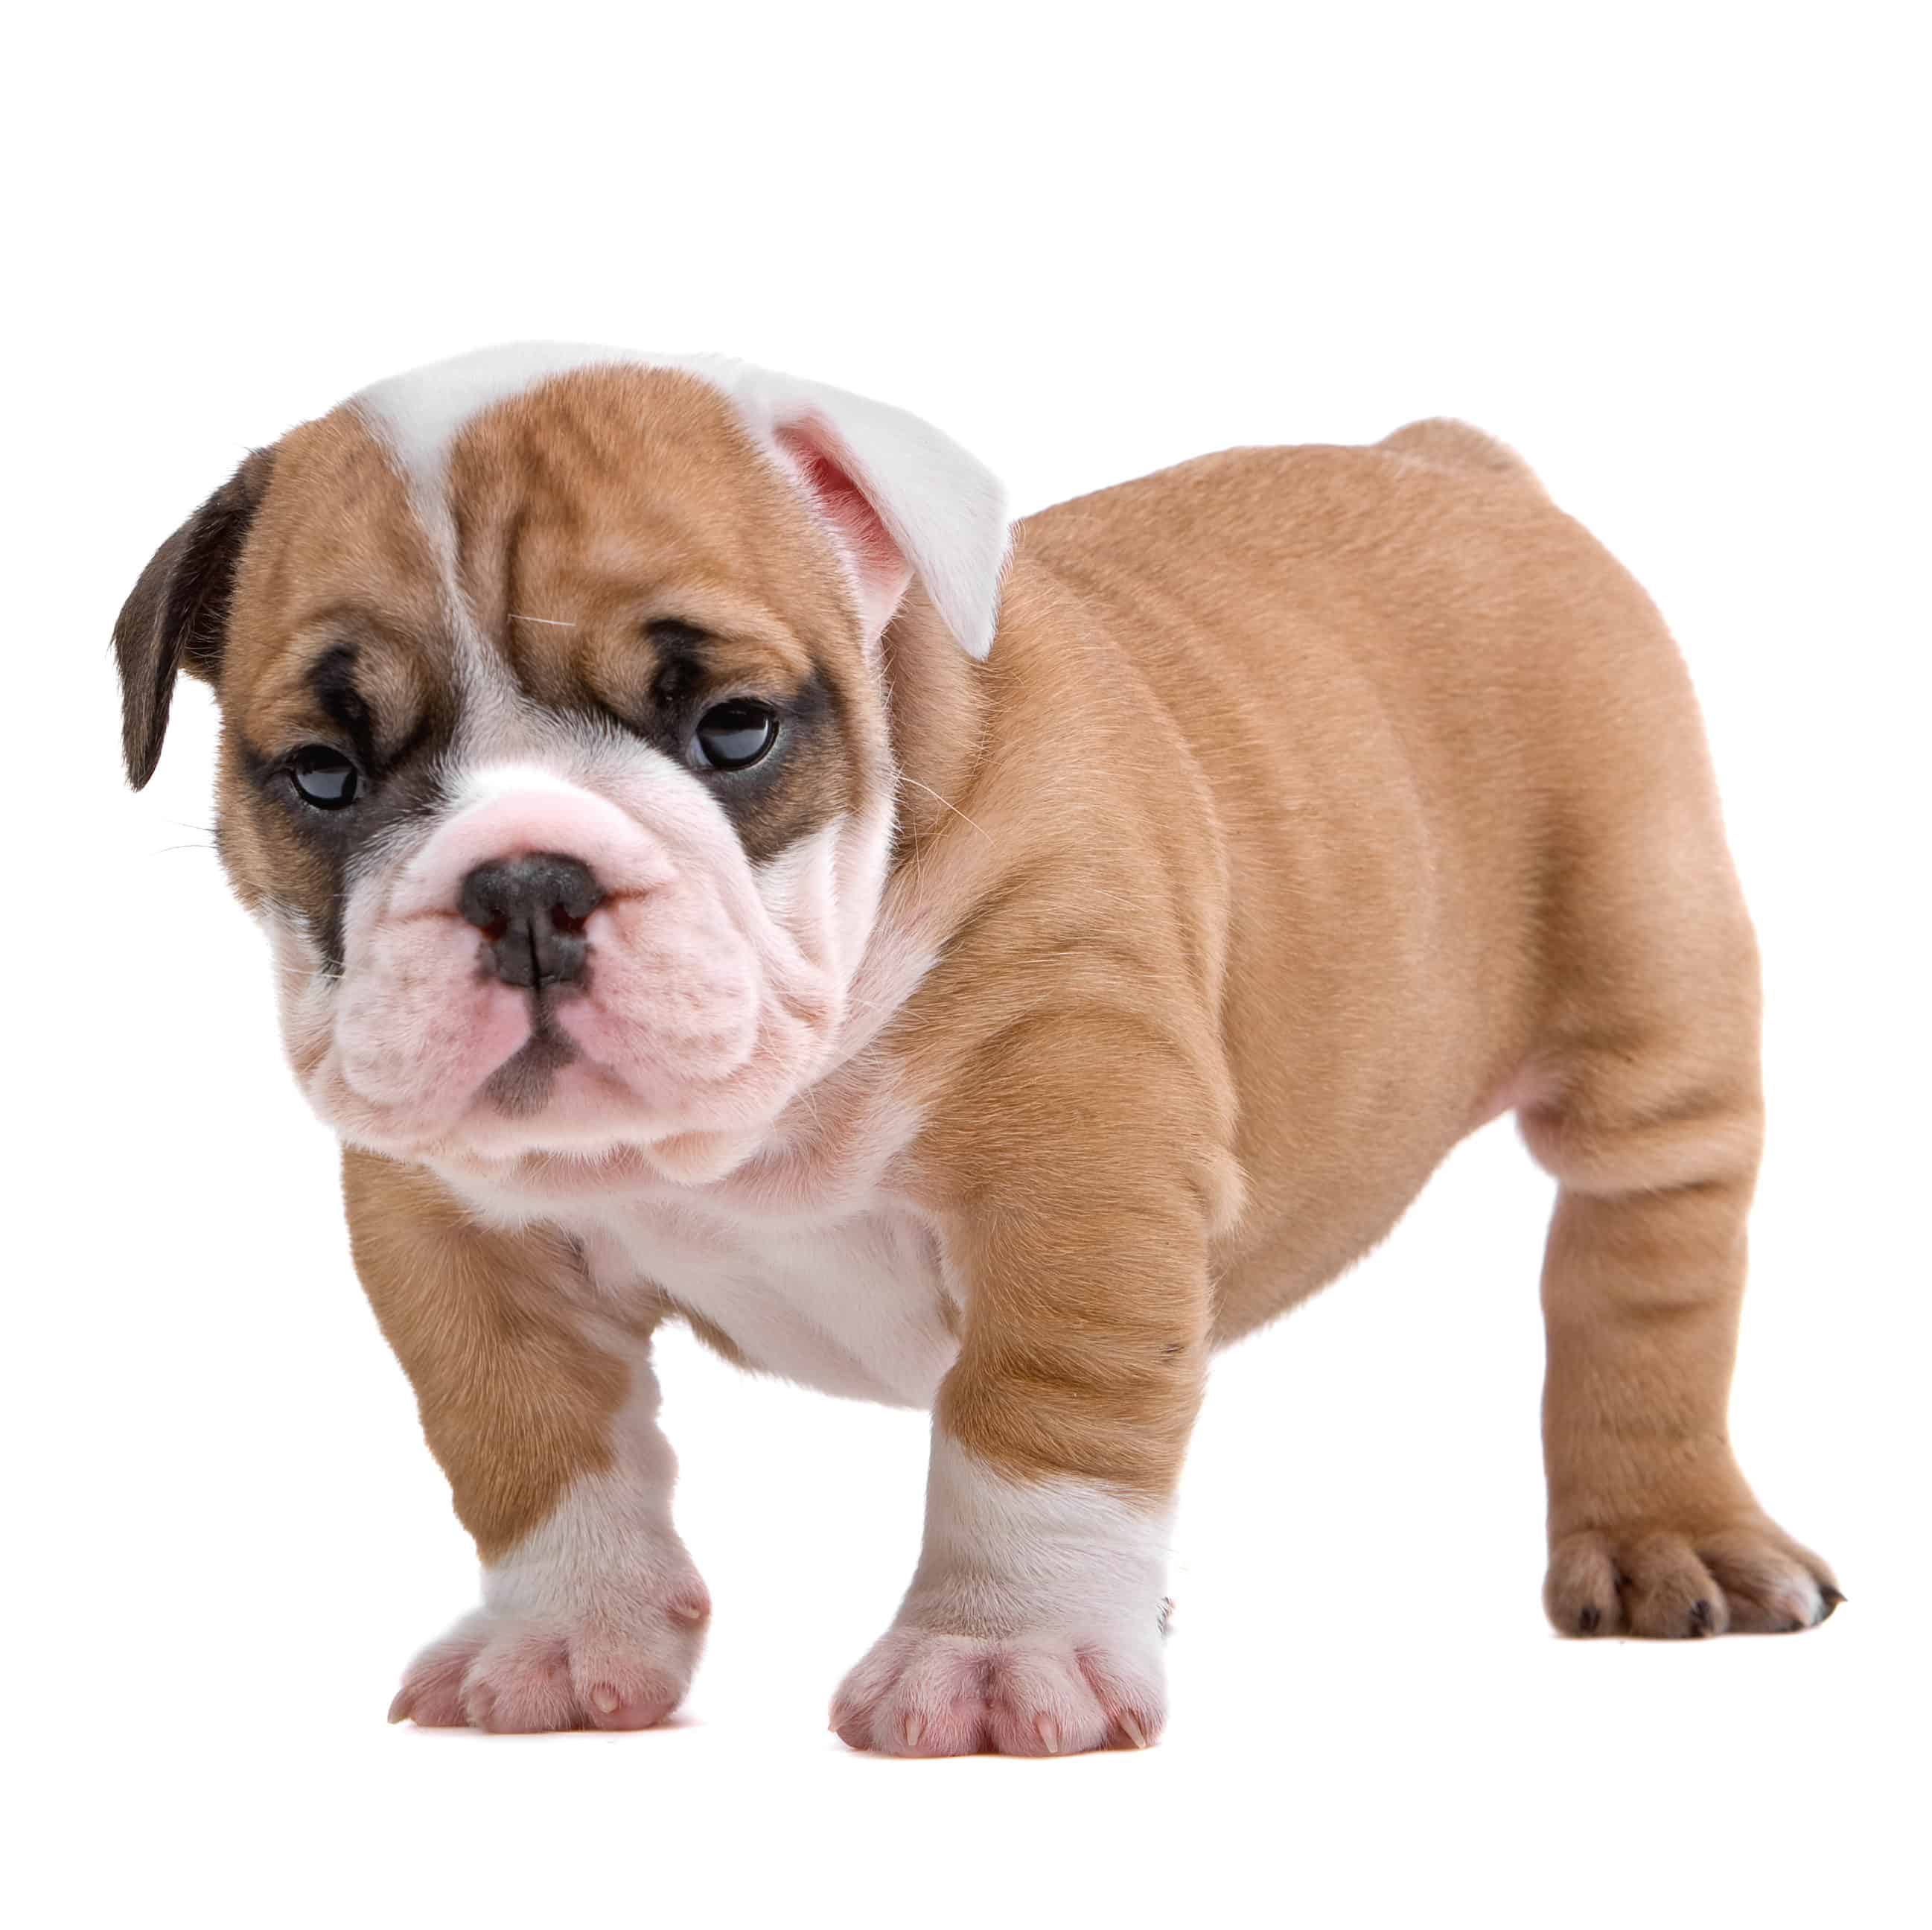 Best Food For English Bulldog Puppy In 2021 Goodpuppyfood